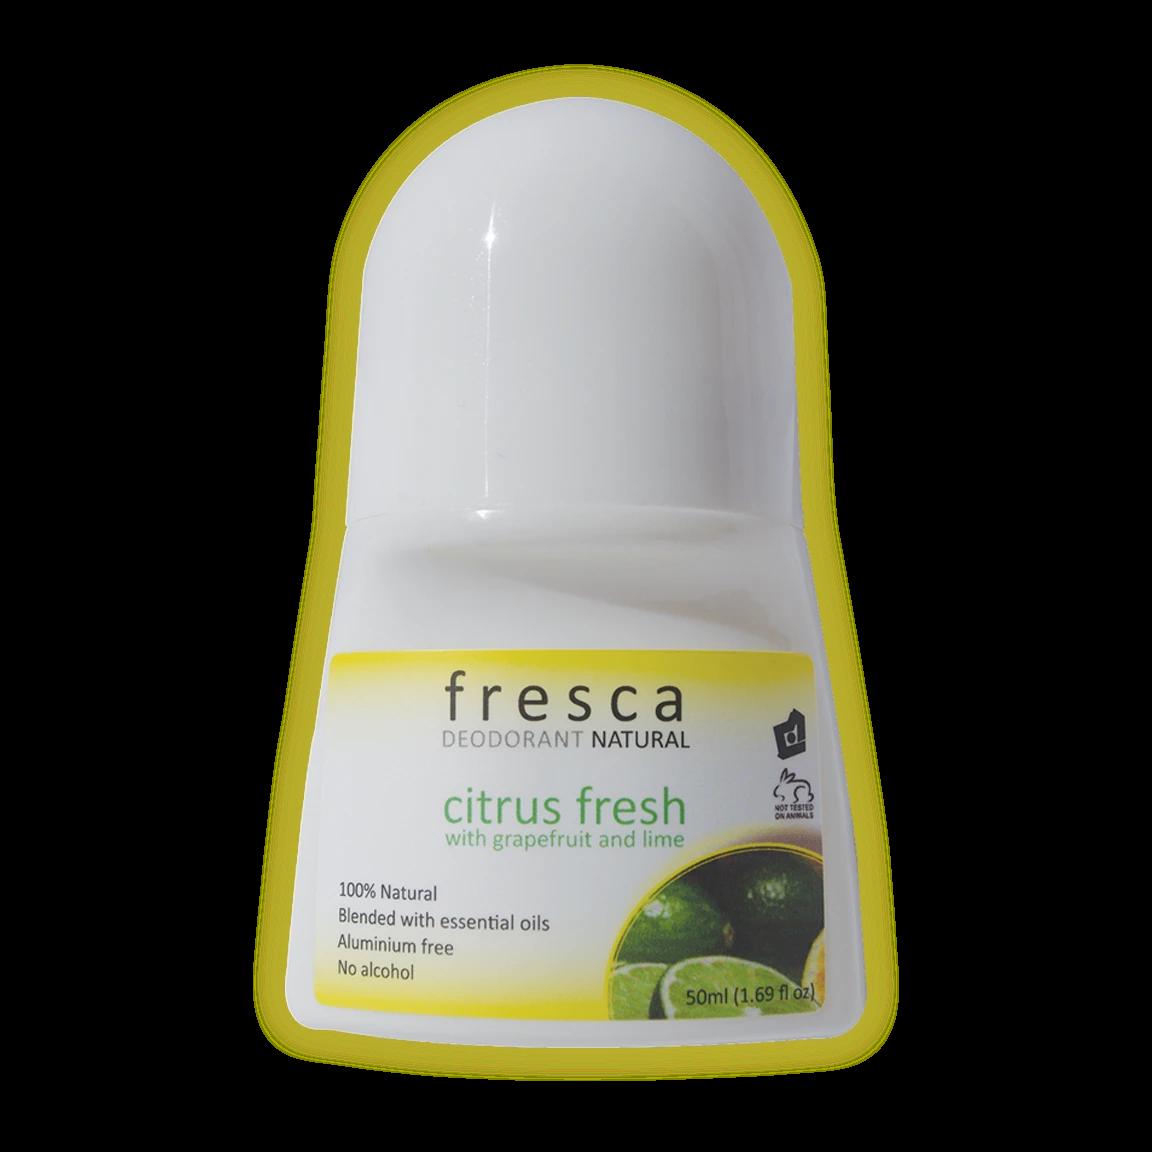 Fresca Natural Deodorant